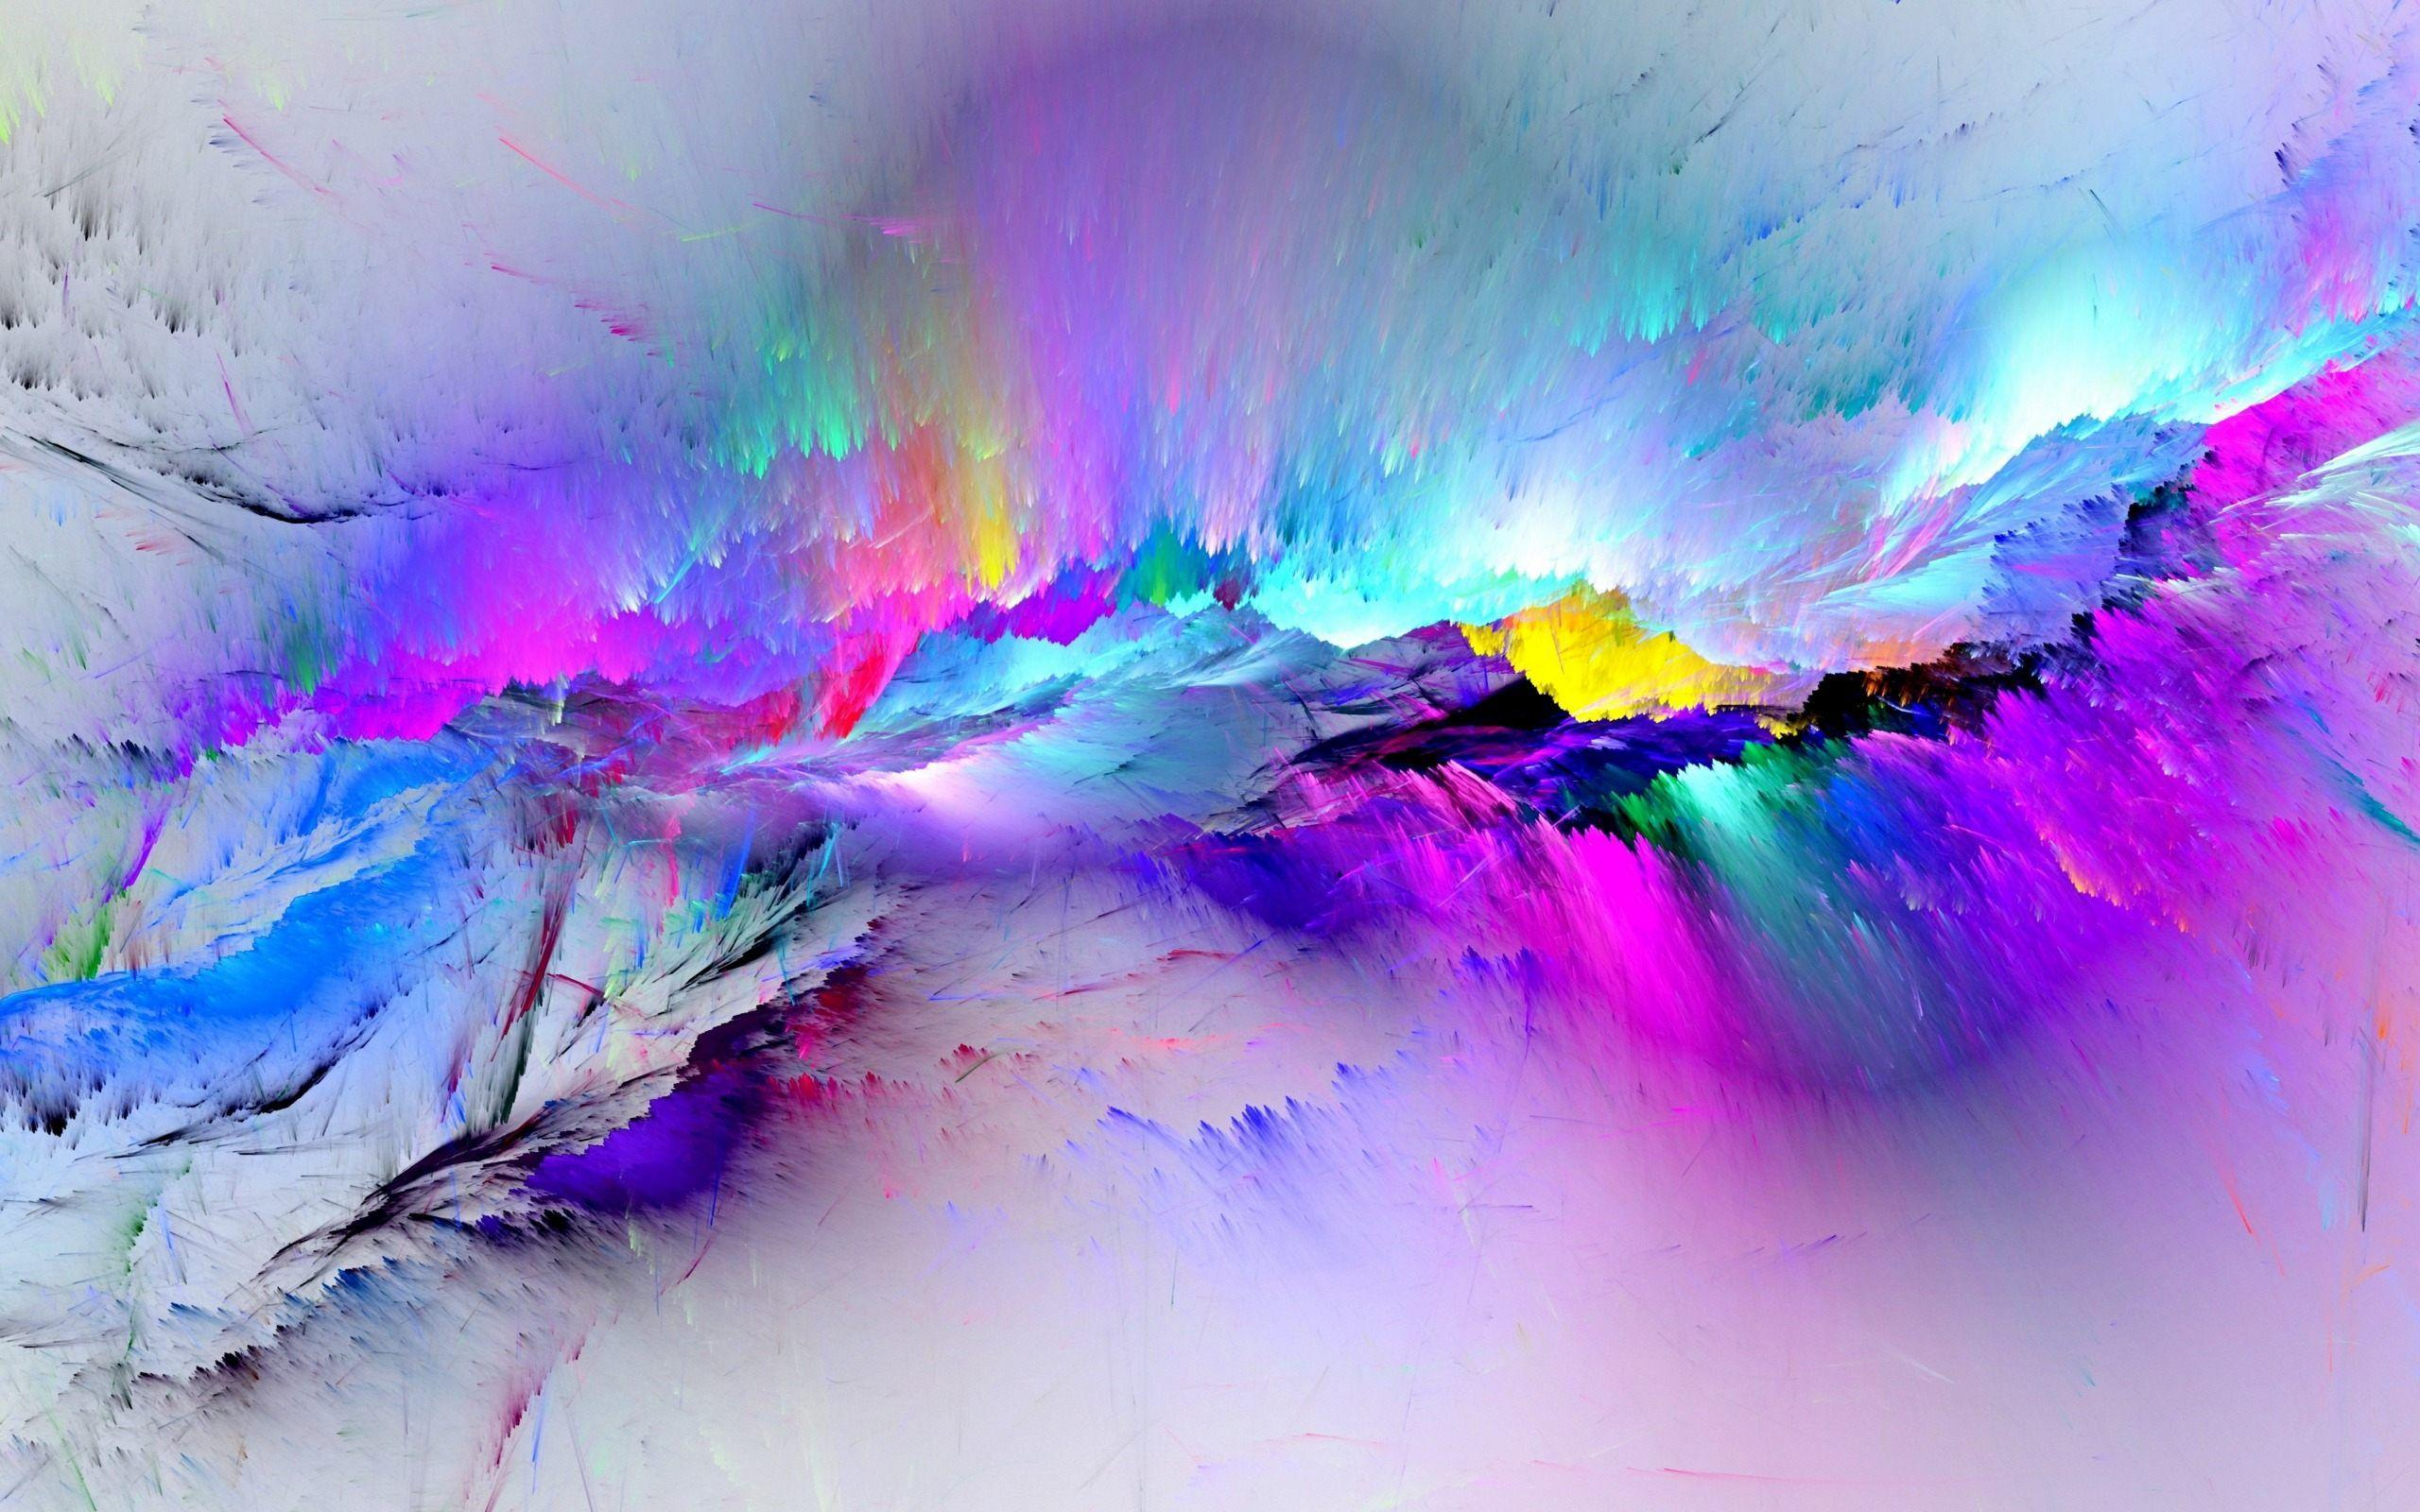 Color Splash Wallpaper HD